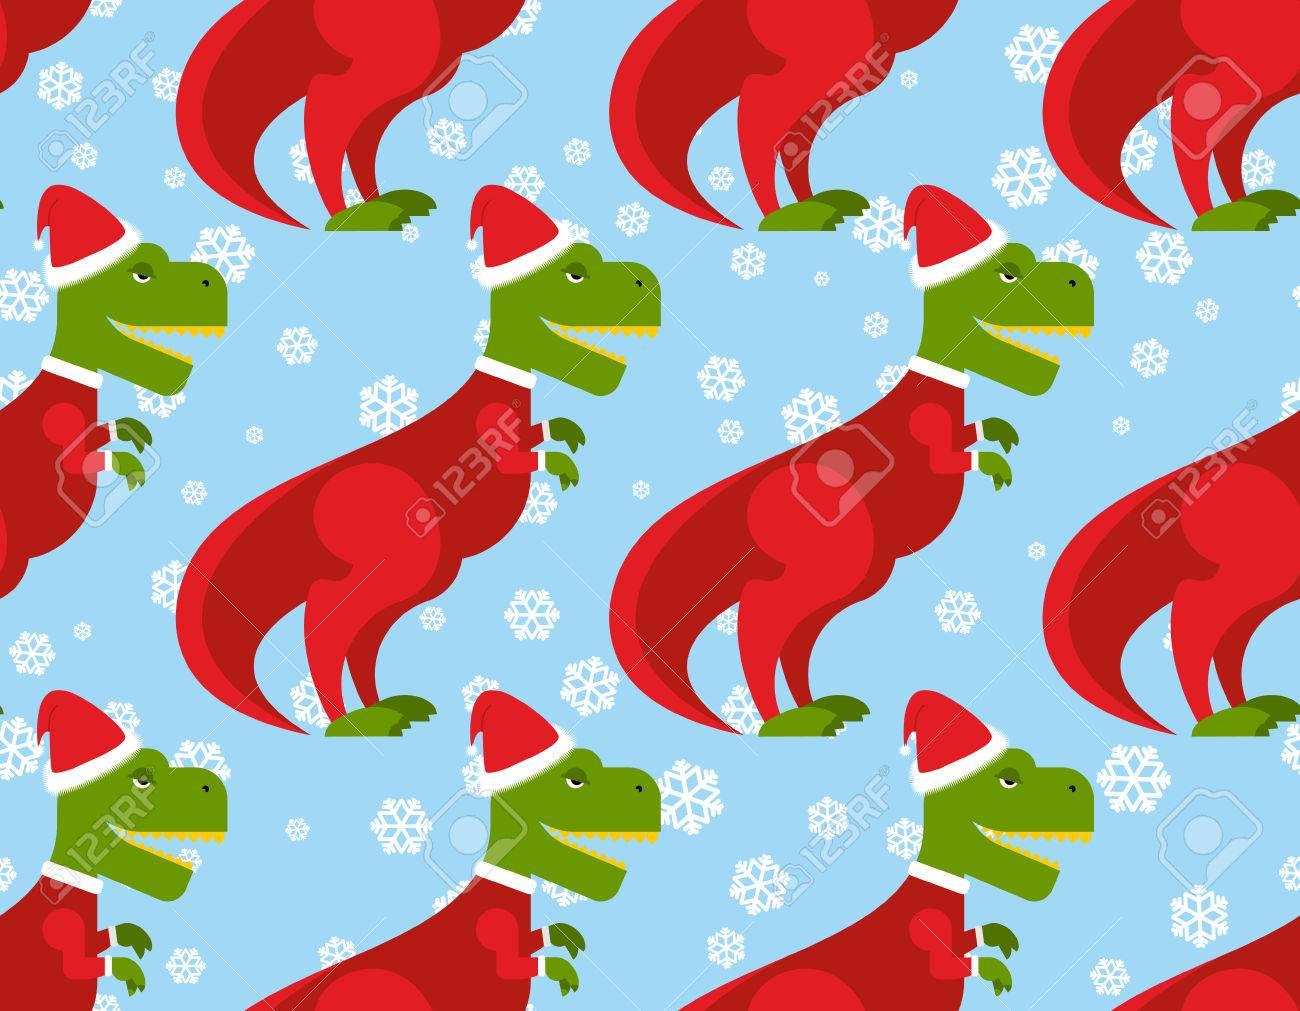 Christmas Dinosaur.T Rex Santa Claus Seamless Pattern Christmas Dinosaur Backdrop